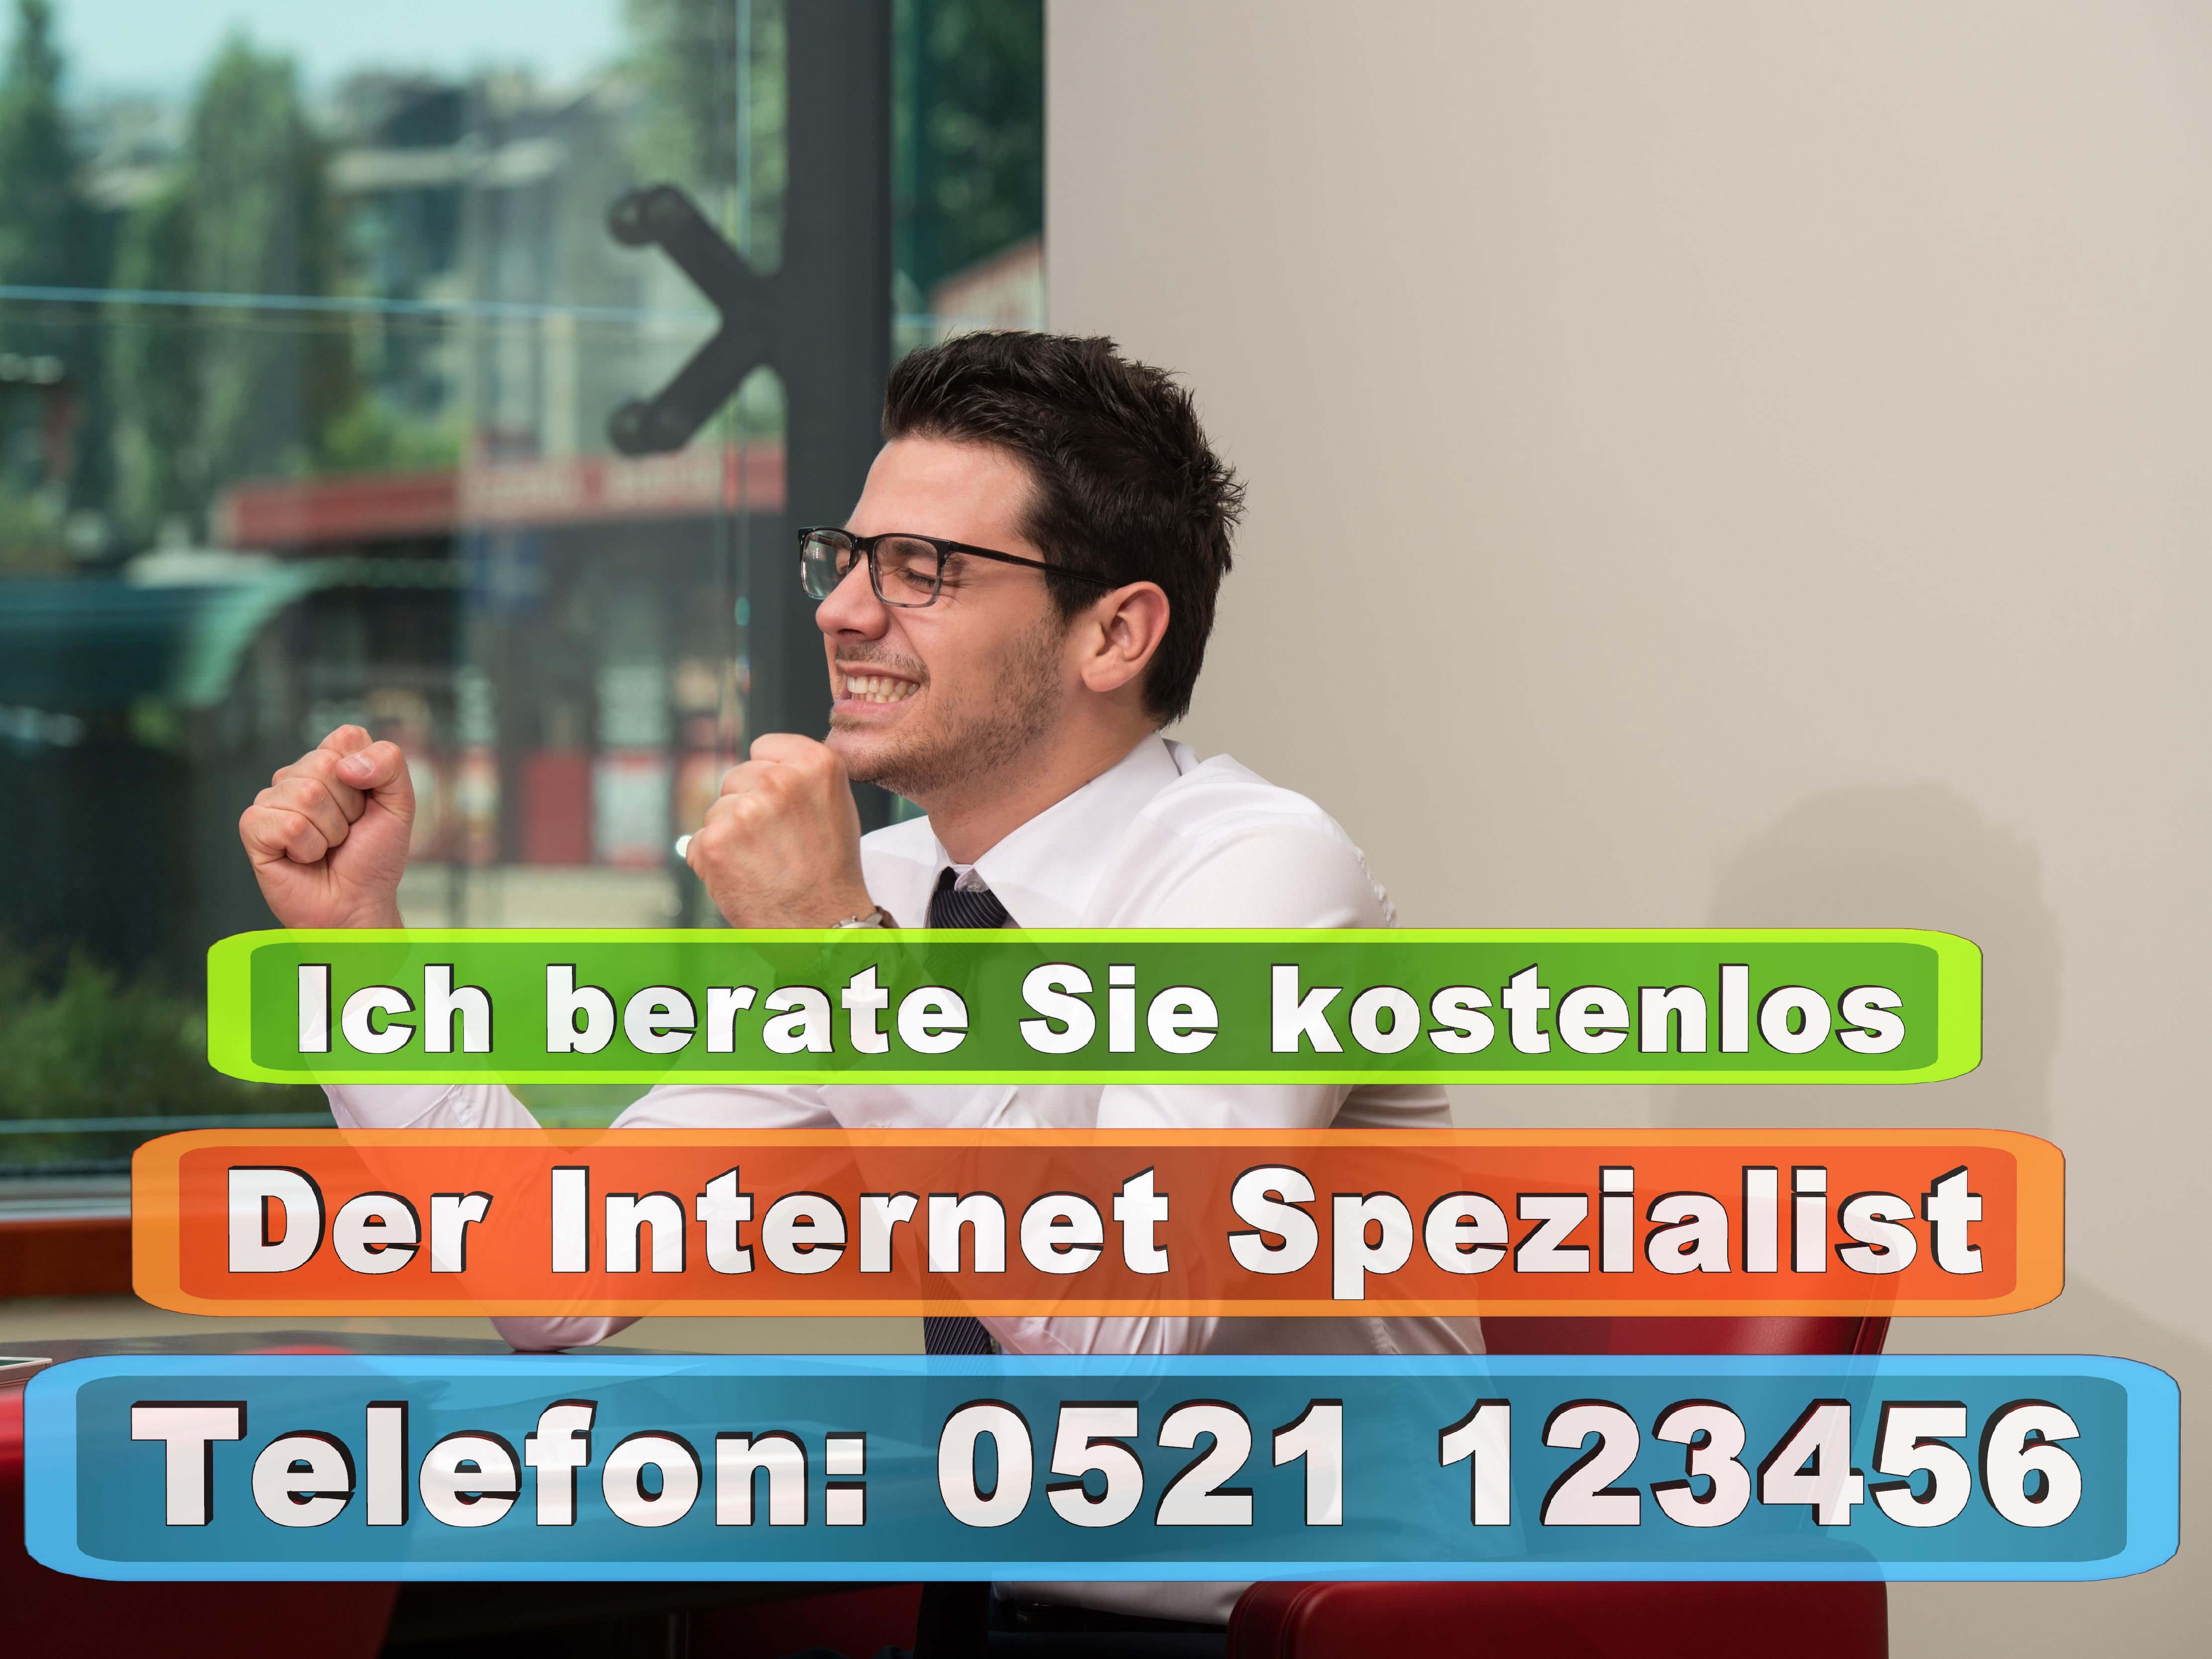 Rechtsanwalt In Bielefeld Steuerberater NRW OWL Paderborn Münster Dortmund Berlin Hamburg Düsseldorf Köln